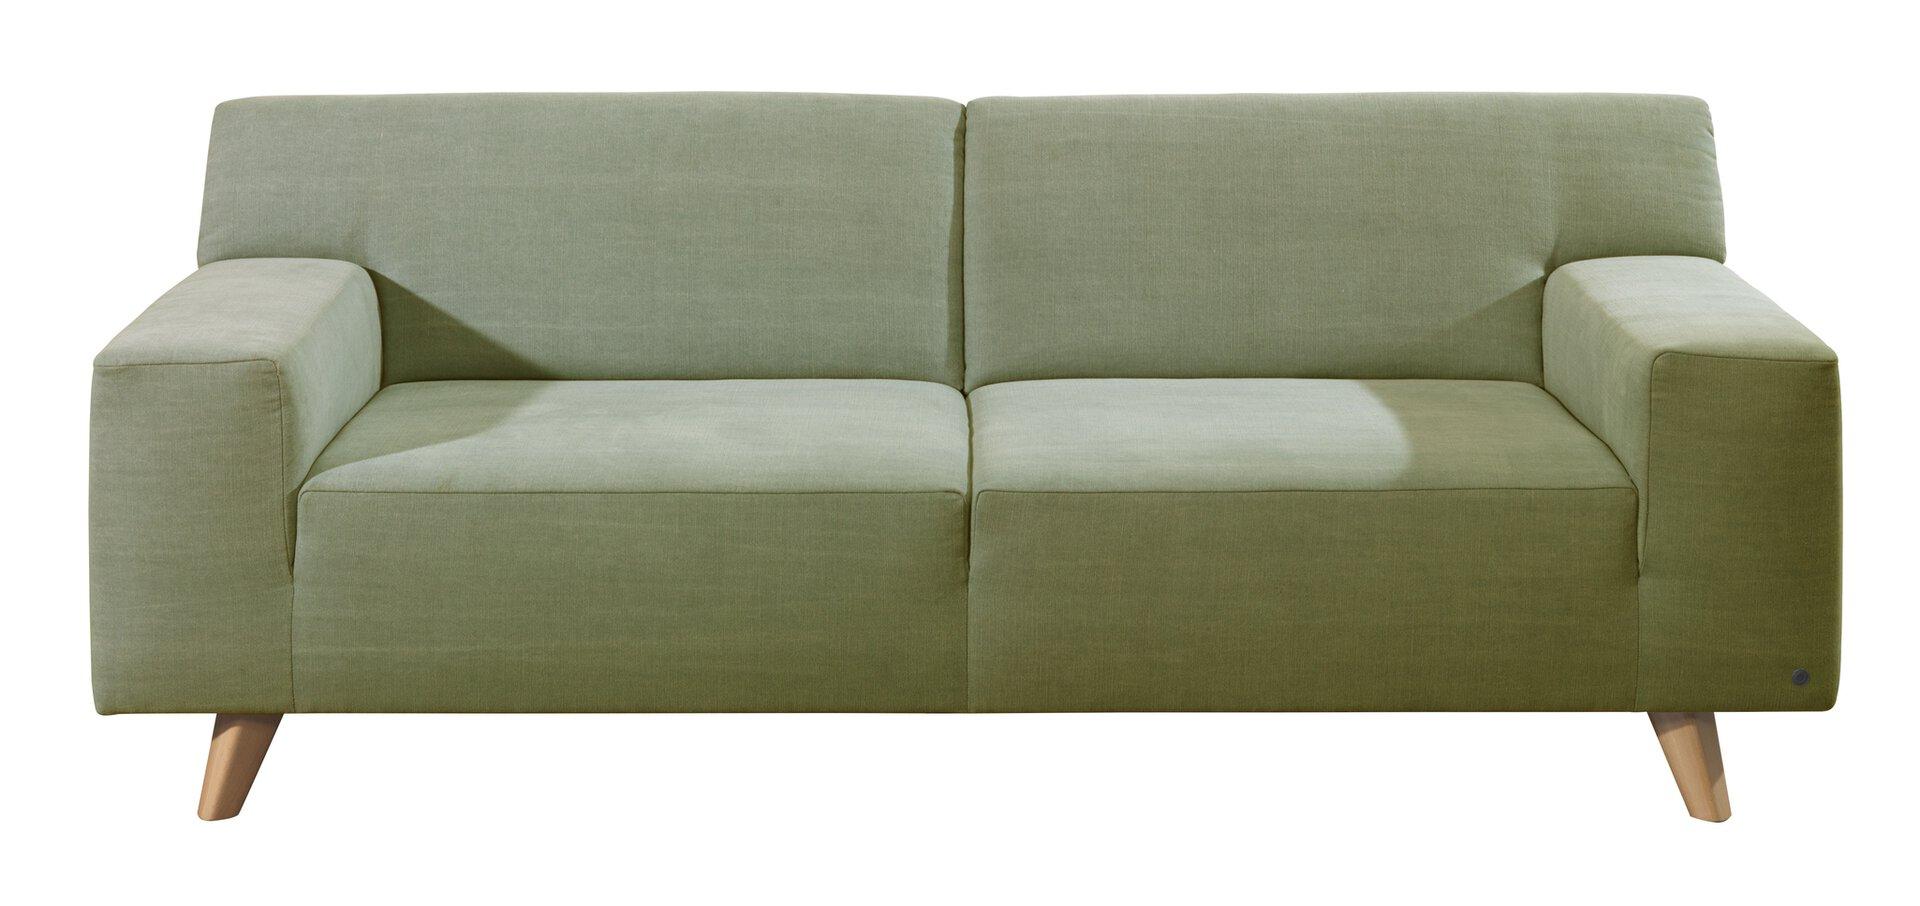 Sofa 2-Sitzer NORDIC PURE Tom Tailor Textil 77 x 91 x 206 cm